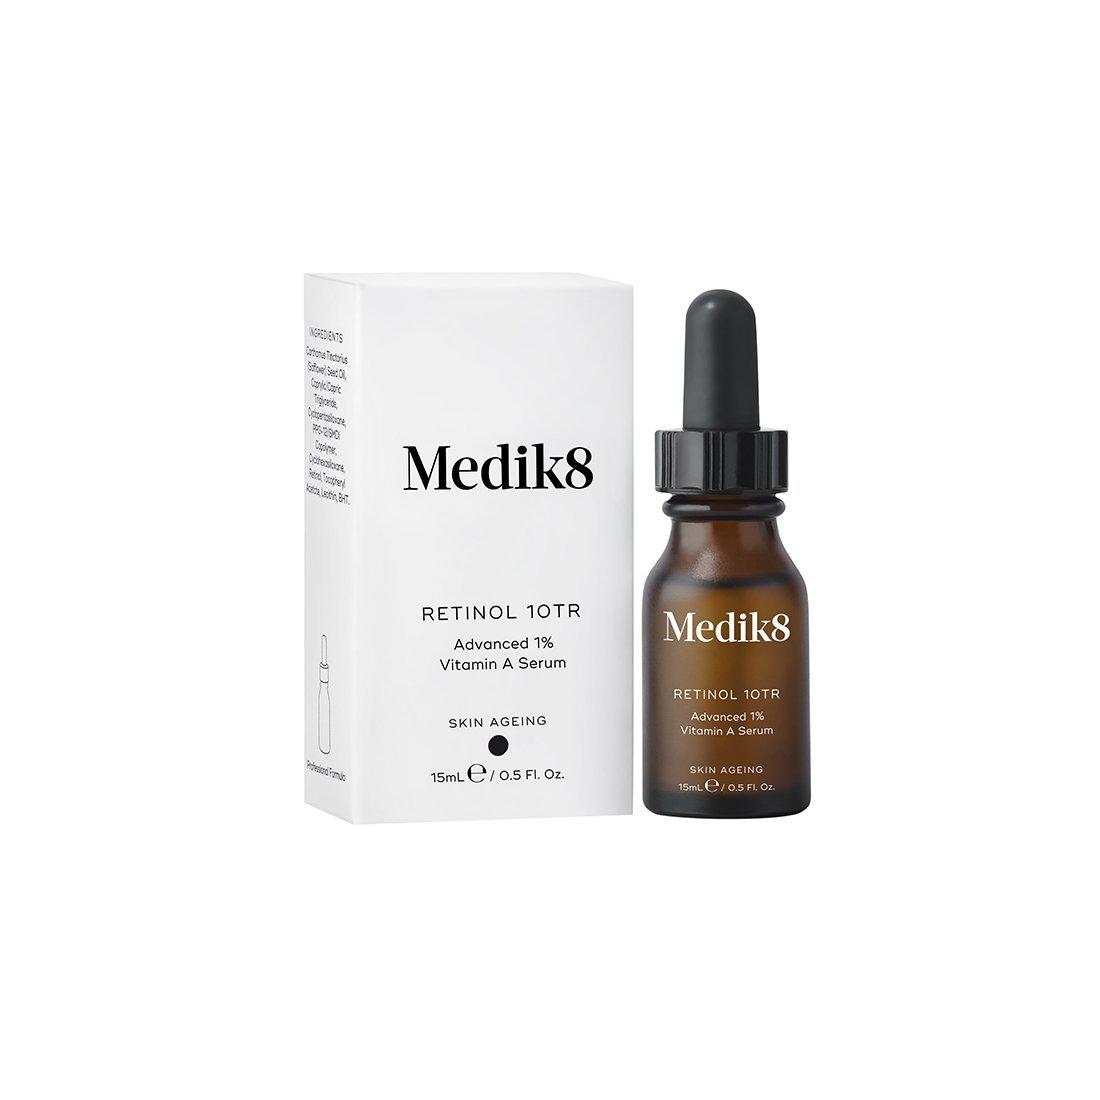 Medik8 Retinol 10 TR Serum 15 ml